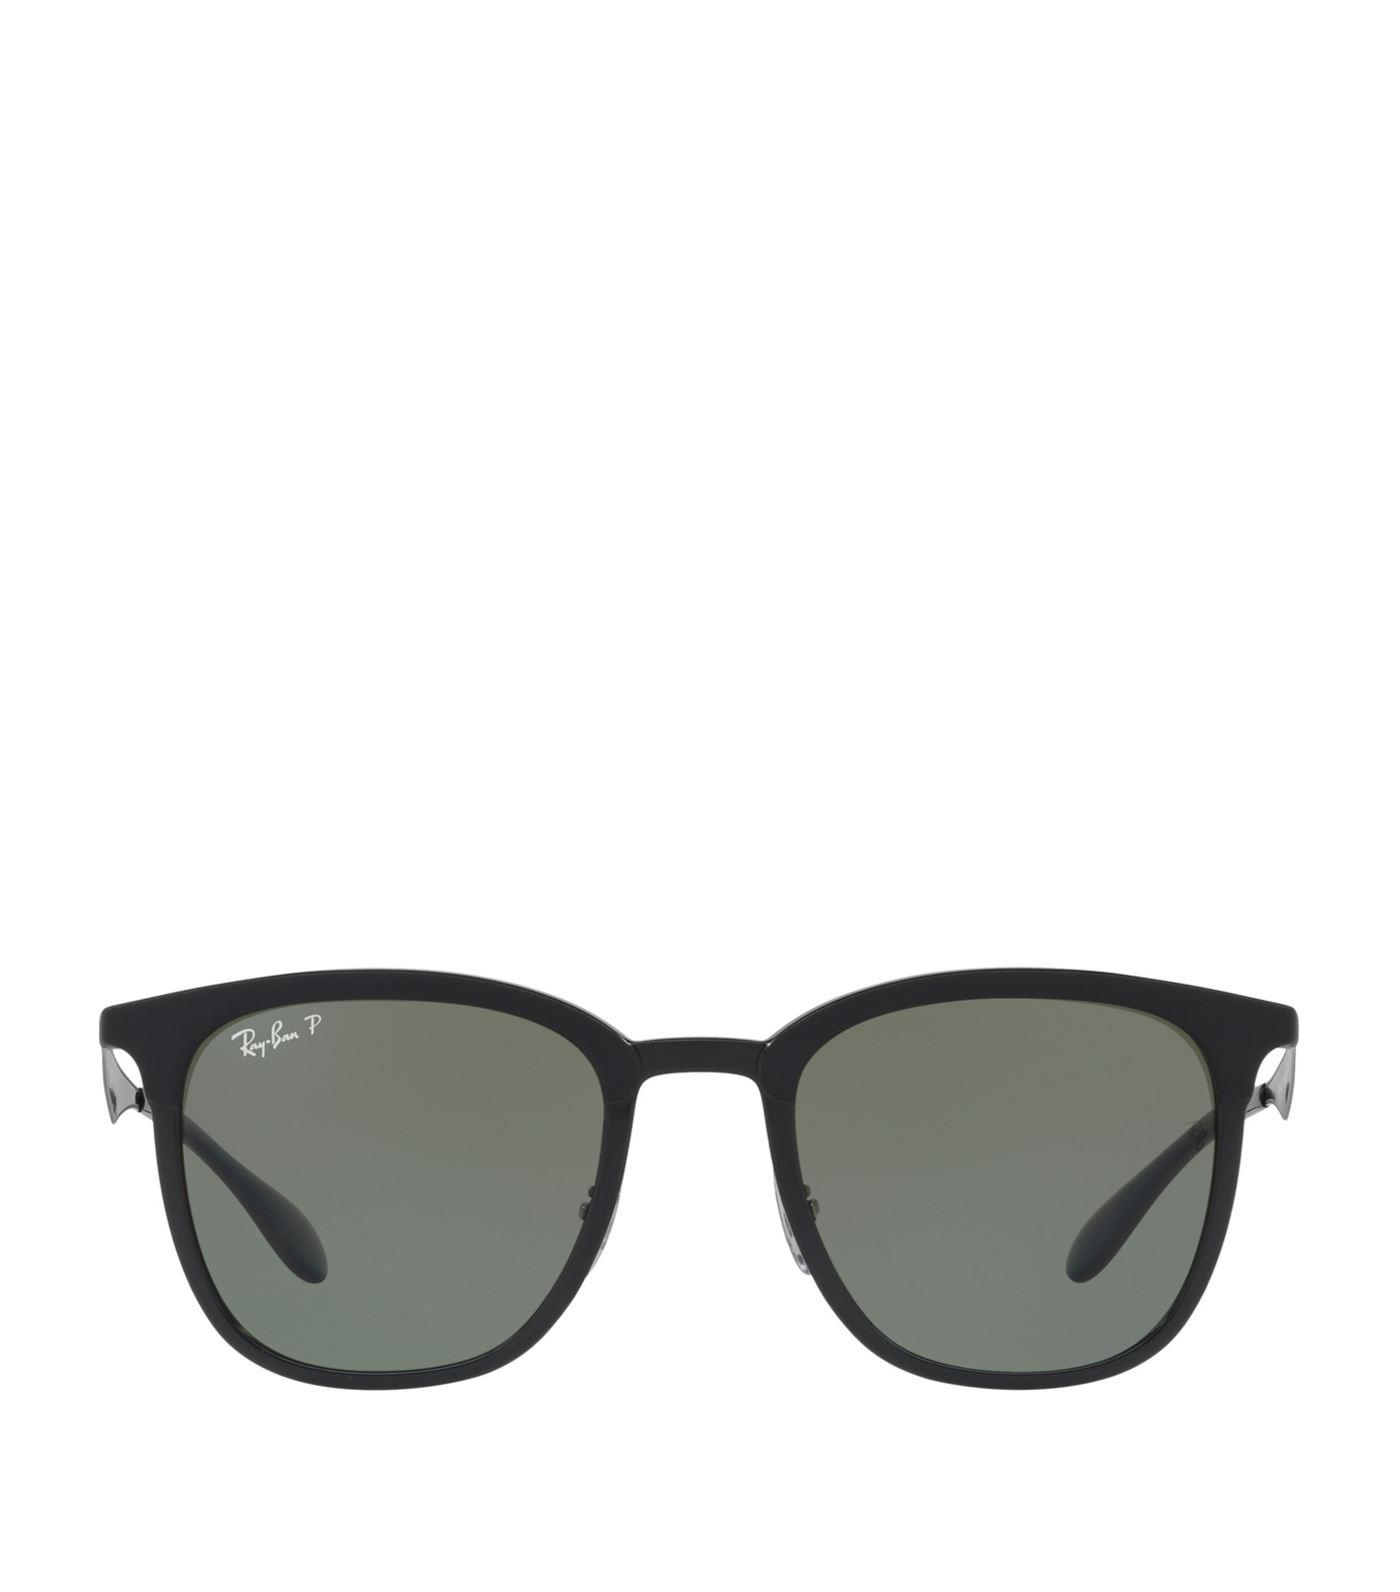 699d0c33544 Ray Ban Ray-Ban Polarized Sunglasses